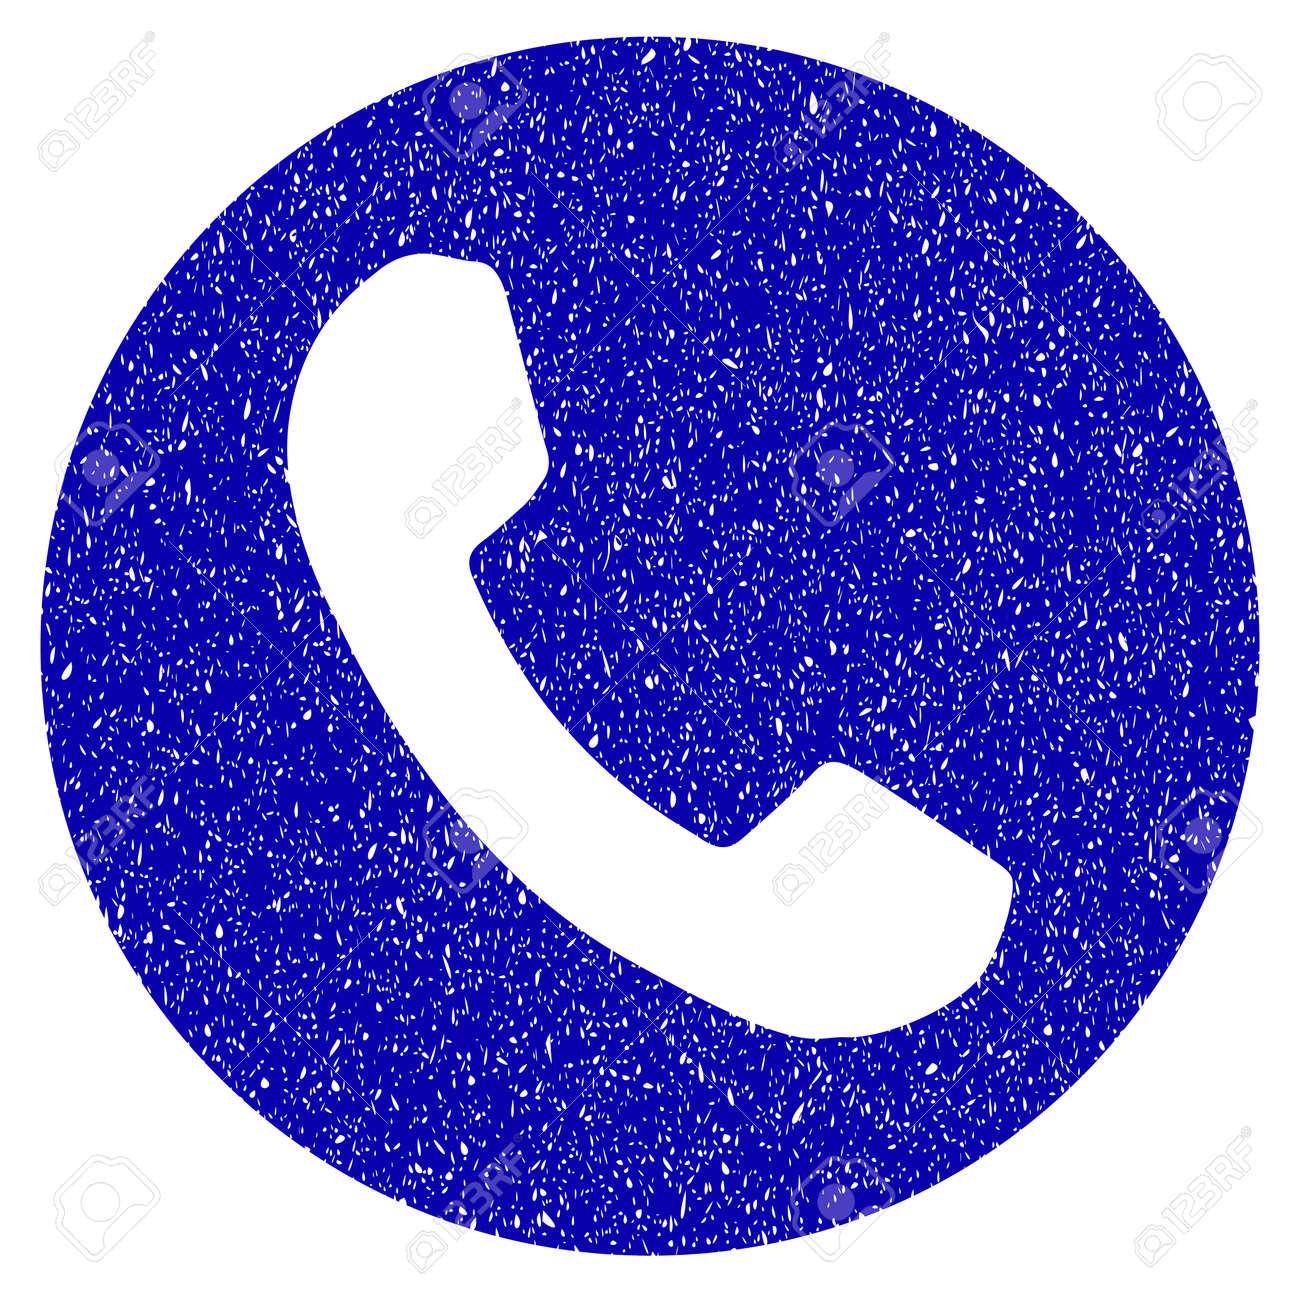 Grunge Phone Number Rubber Seal Stamp Watermark Icon Symbol